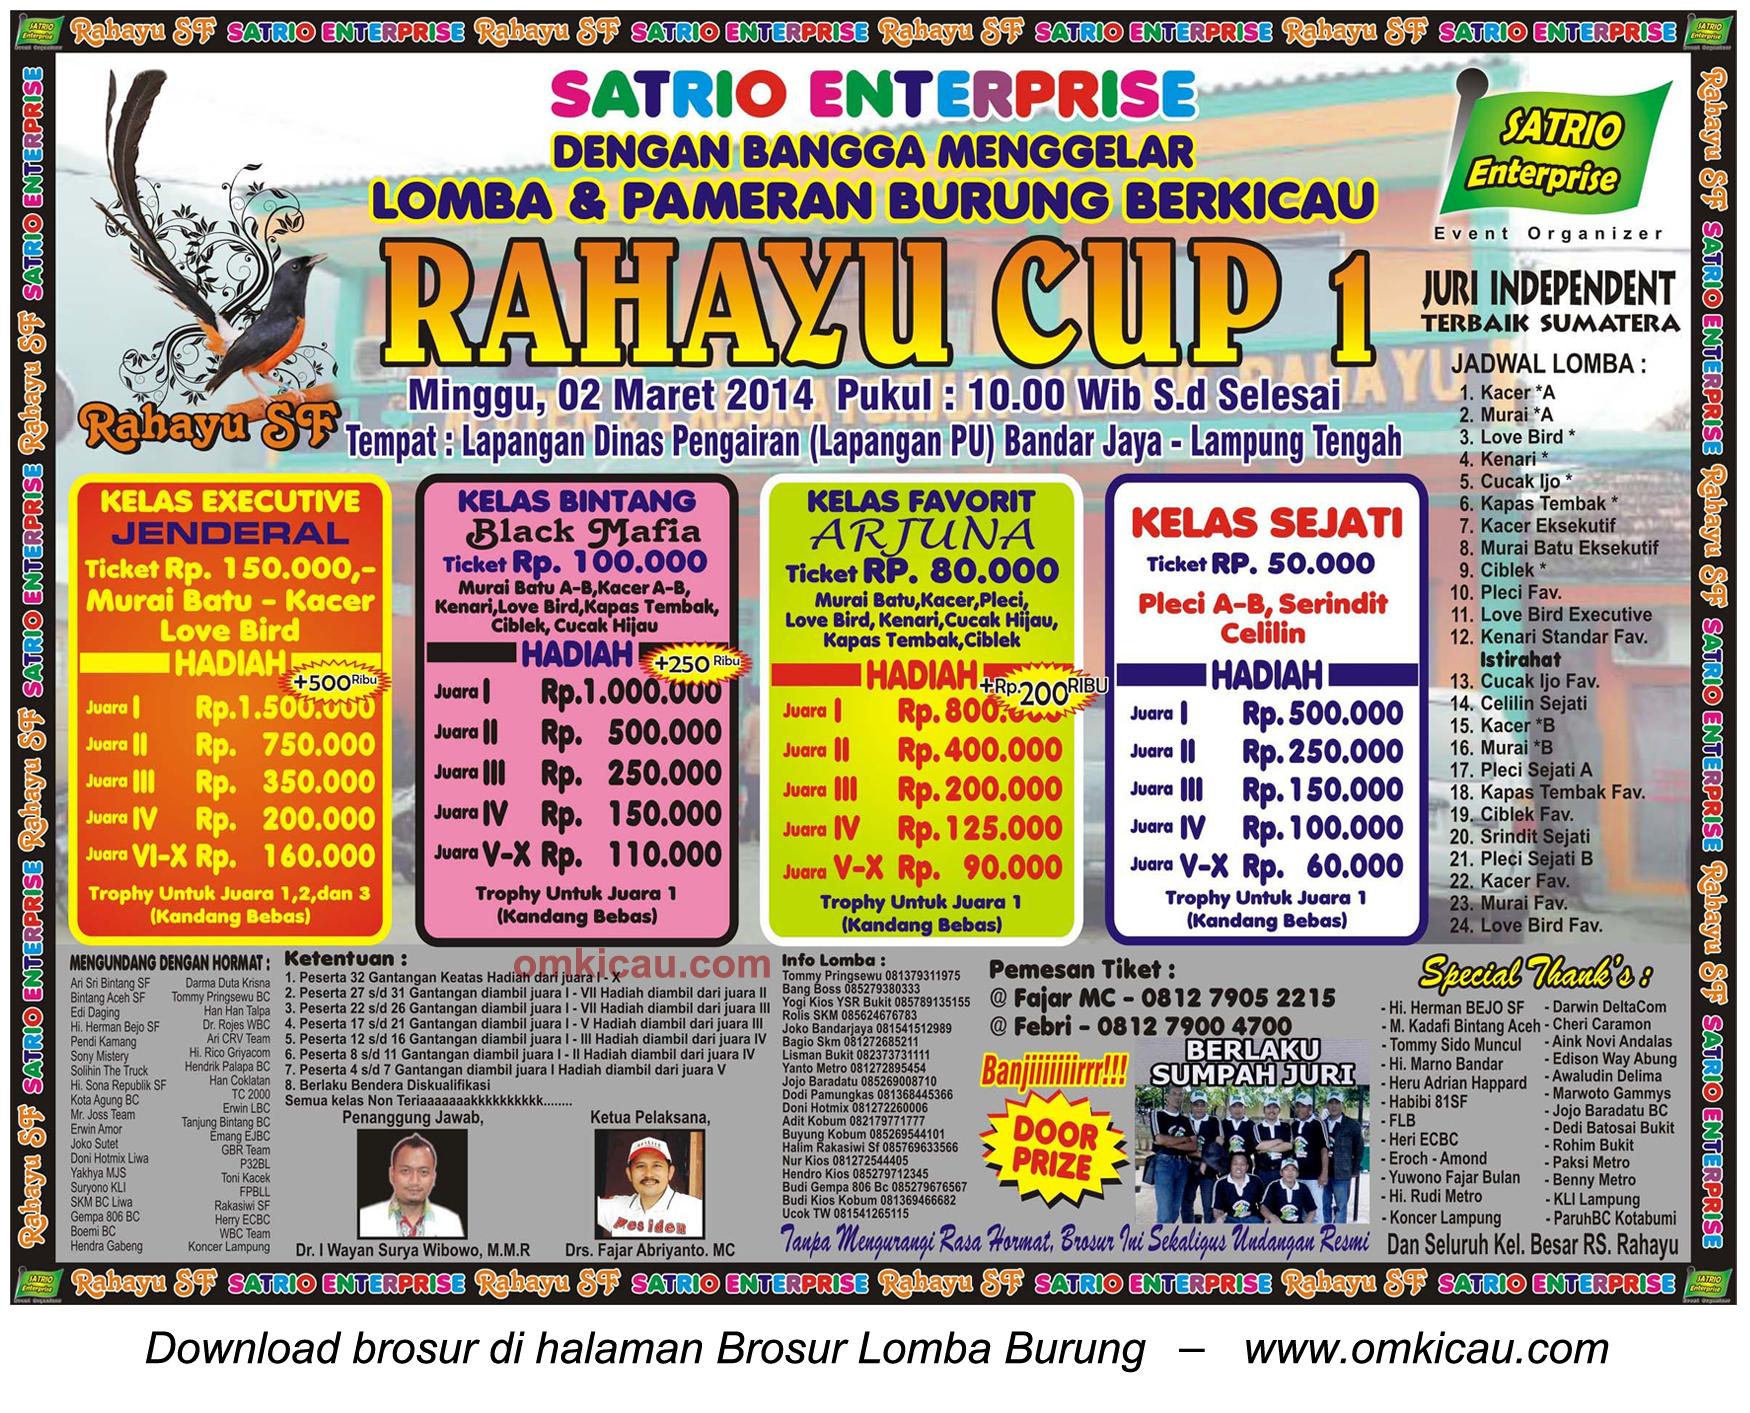 Brosur Lomba Burung Berkicau Rahayu Cup 1, Lampung Tengah, 2 Maret 2014